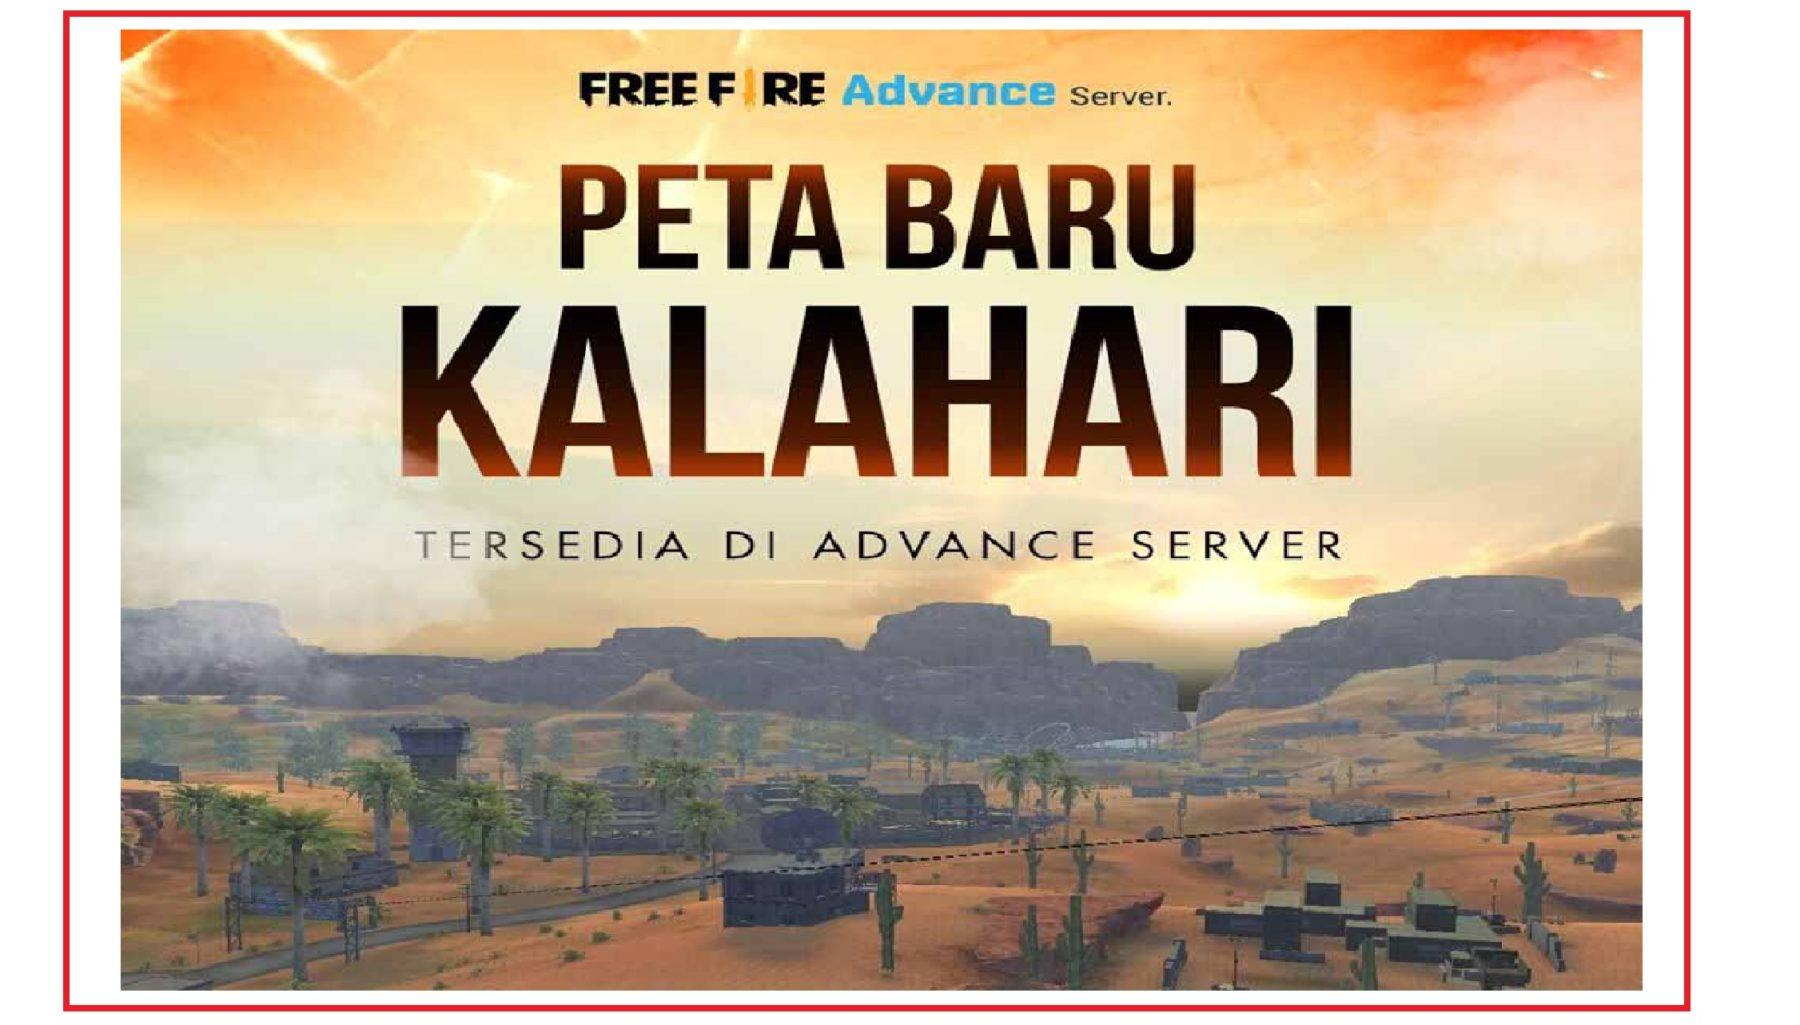 Map Baru Kalahari FF Di Advanced Server Free Fire!